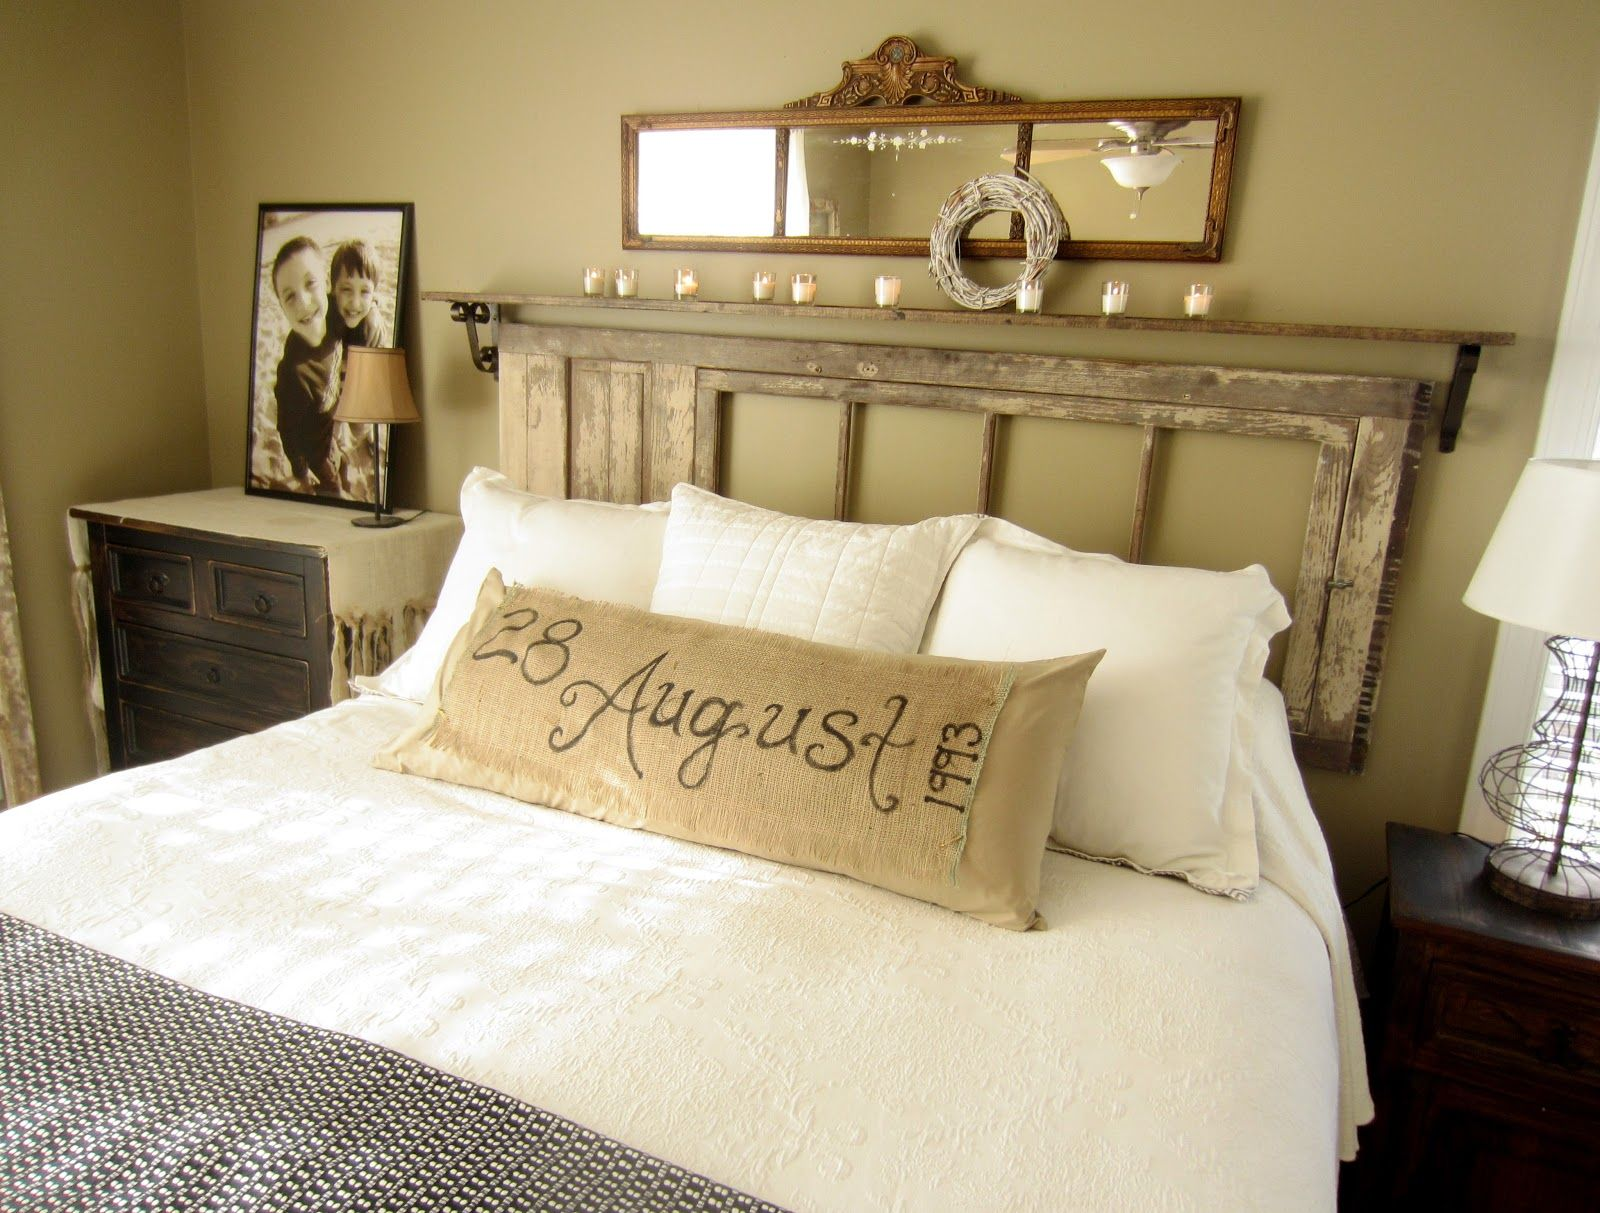 Vintage Rustic Master Bedroom Rustic Master Bedroom Vintage Bedroom Decor Rustic Bedroom Decor